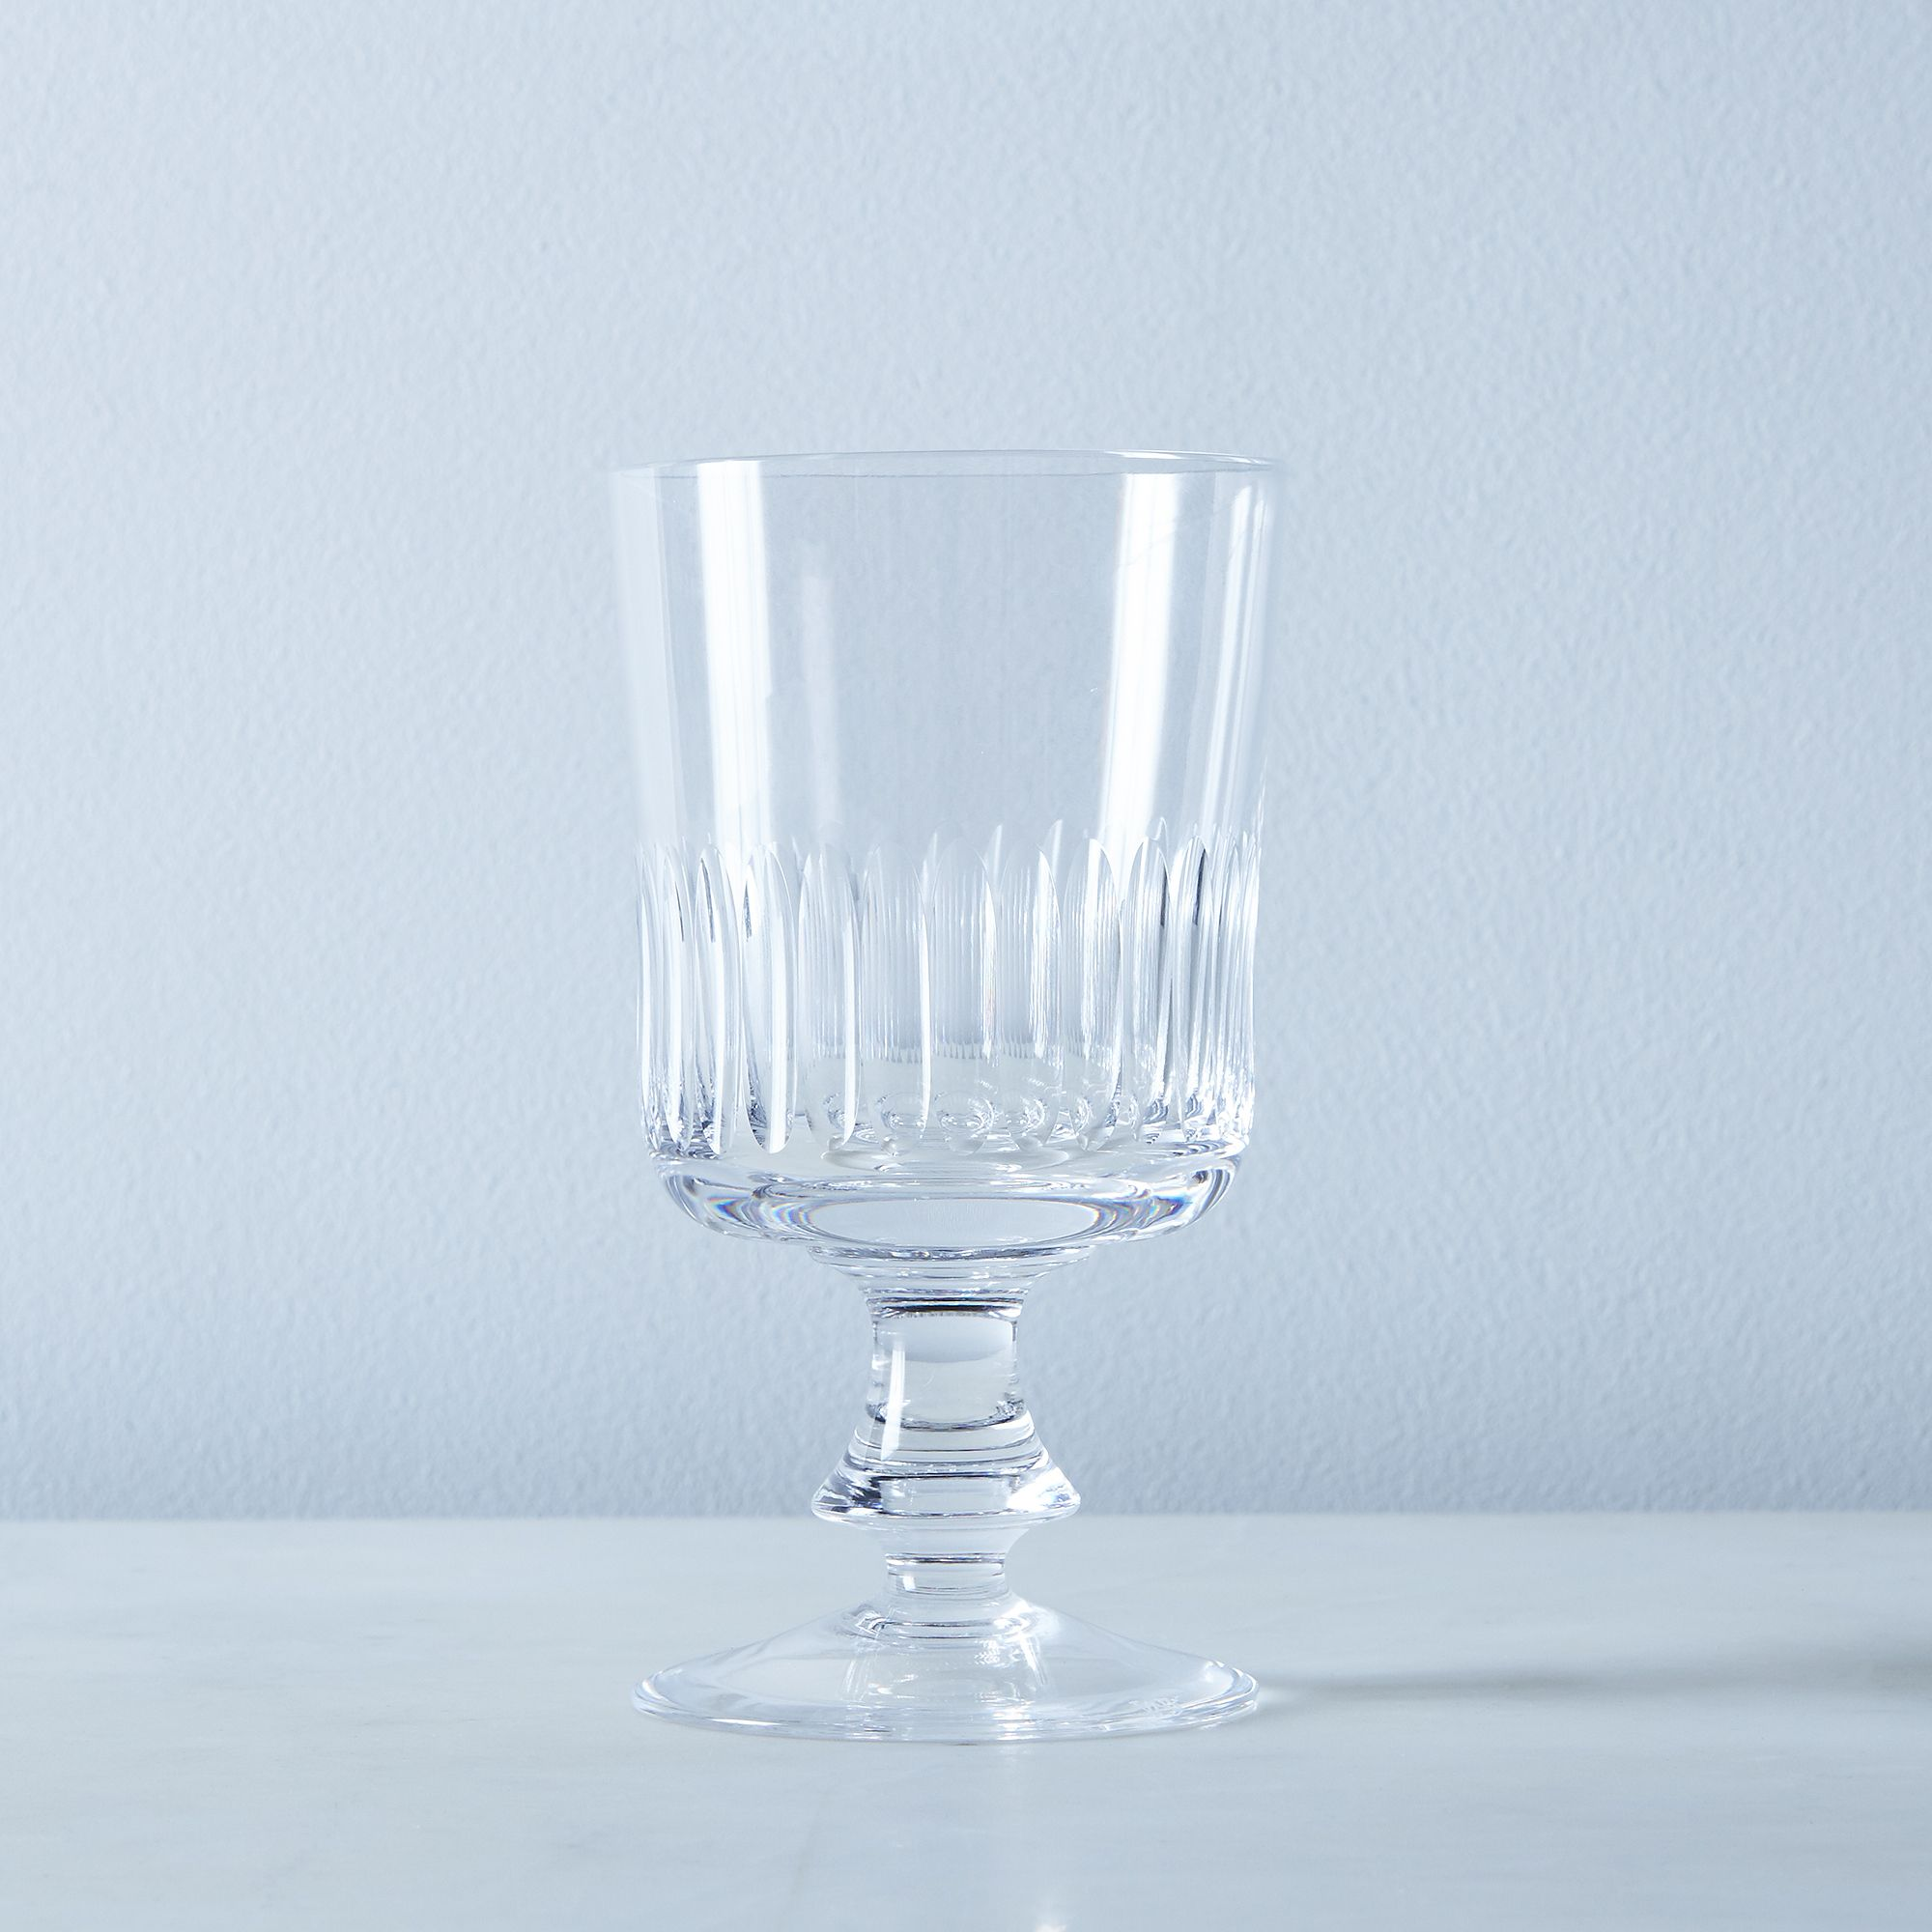 Close Ribs Vintage Italian Crystal Glassware - Fiorello, Goblet